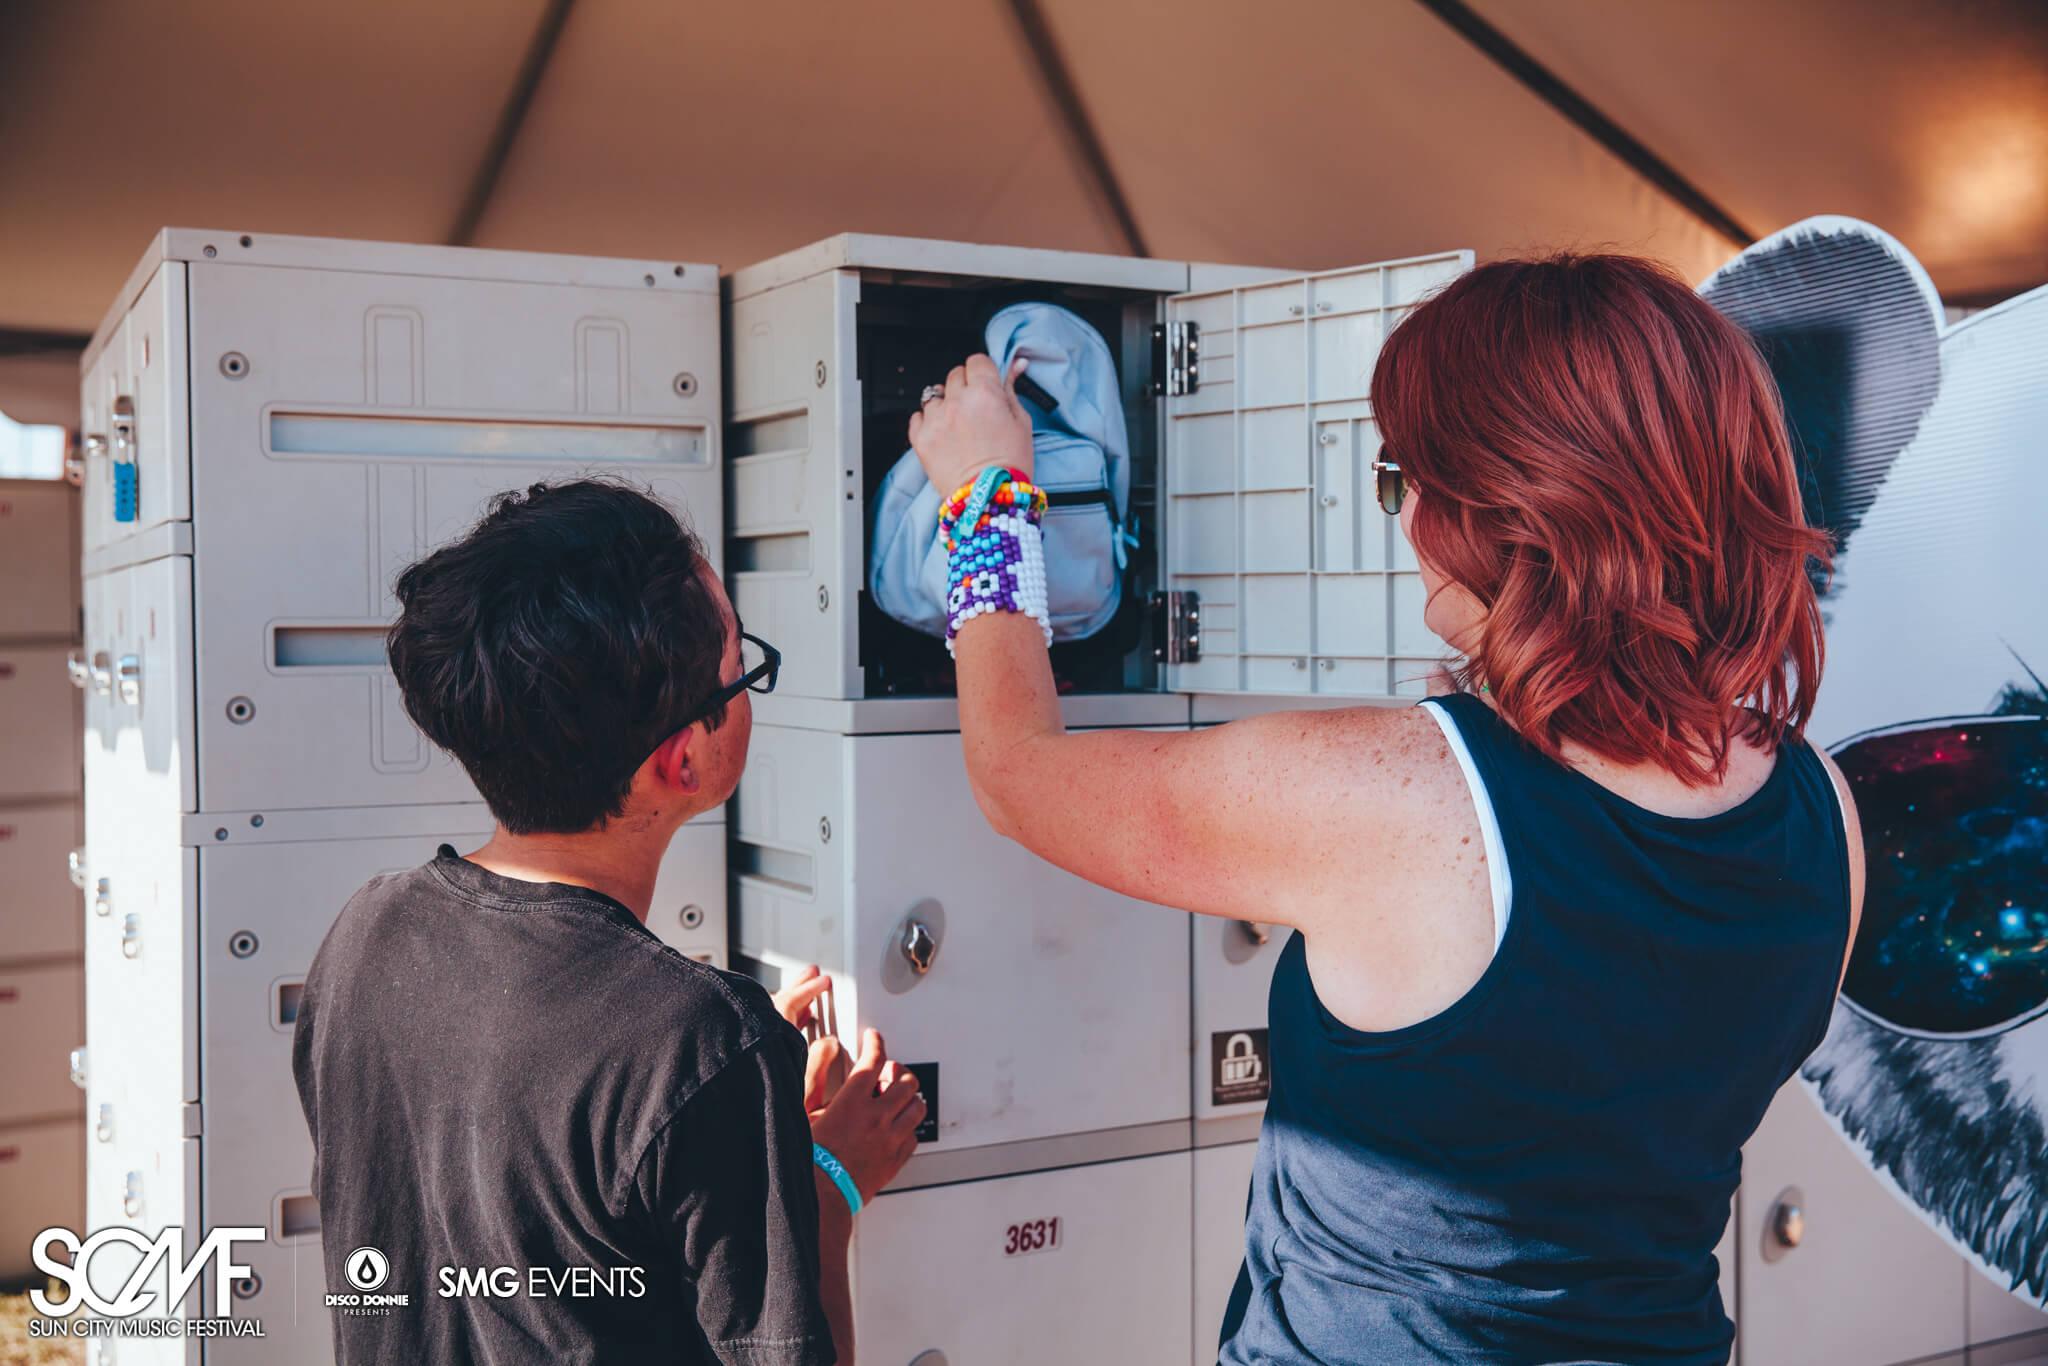 Locker storage at Sun City Music Festival 2015. Photo by Julian Bajsel.